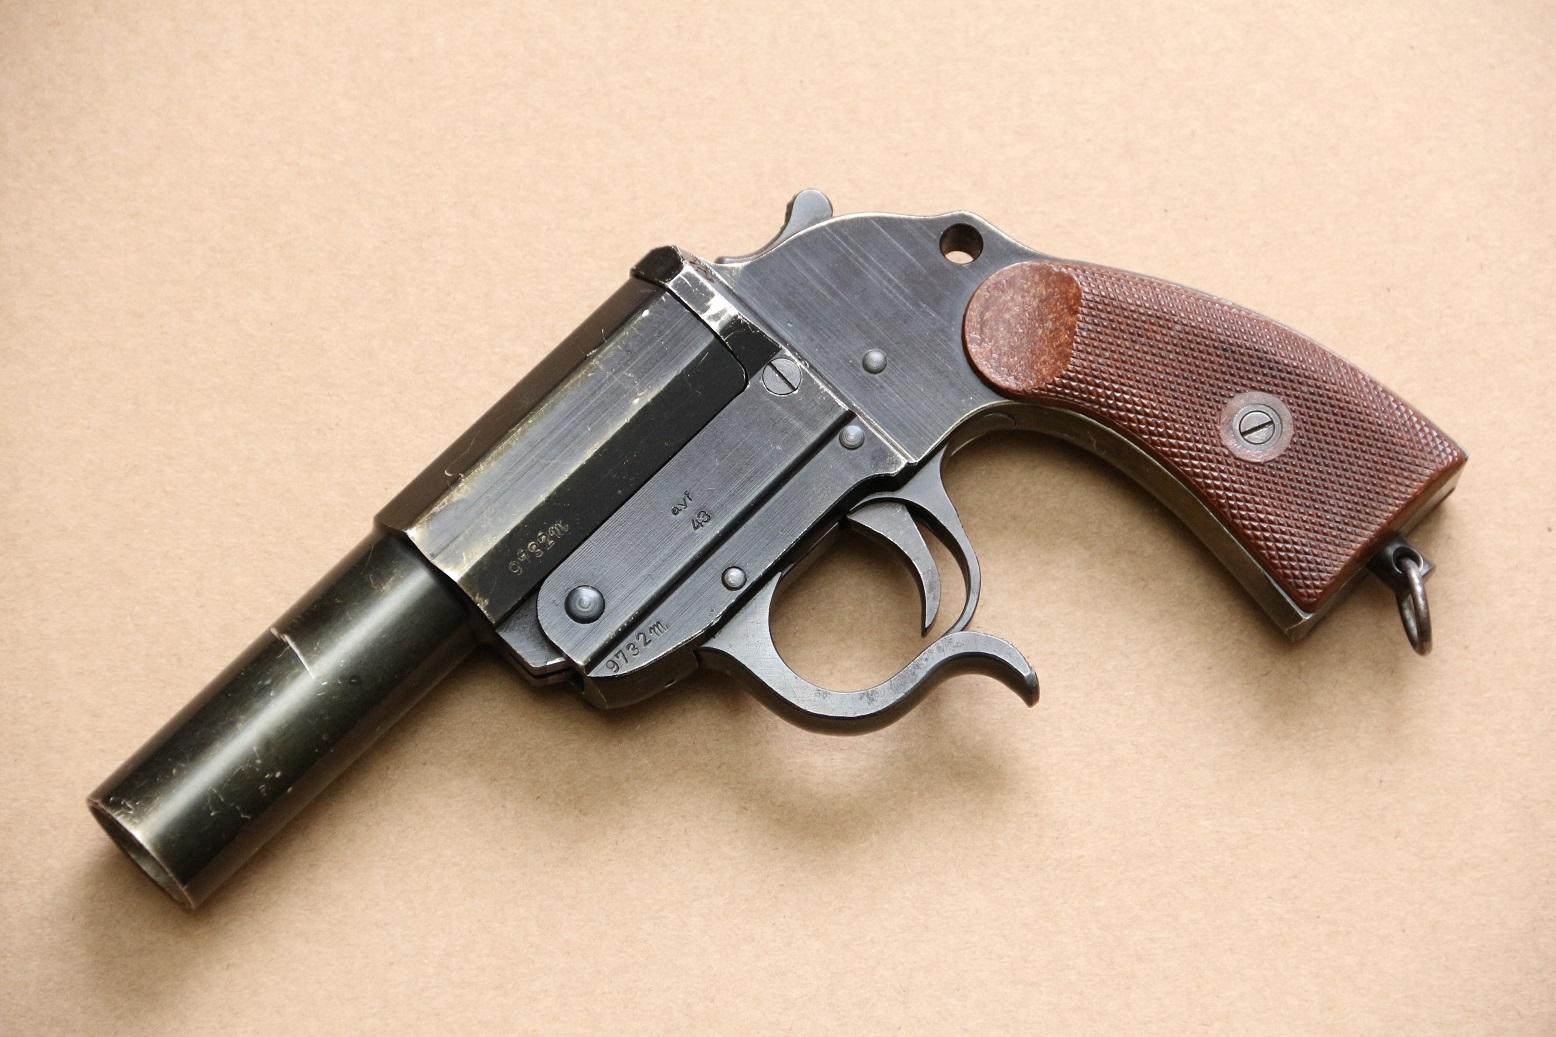 Ракетница Walther LP-34 #9732m, ayf43, 1943 год